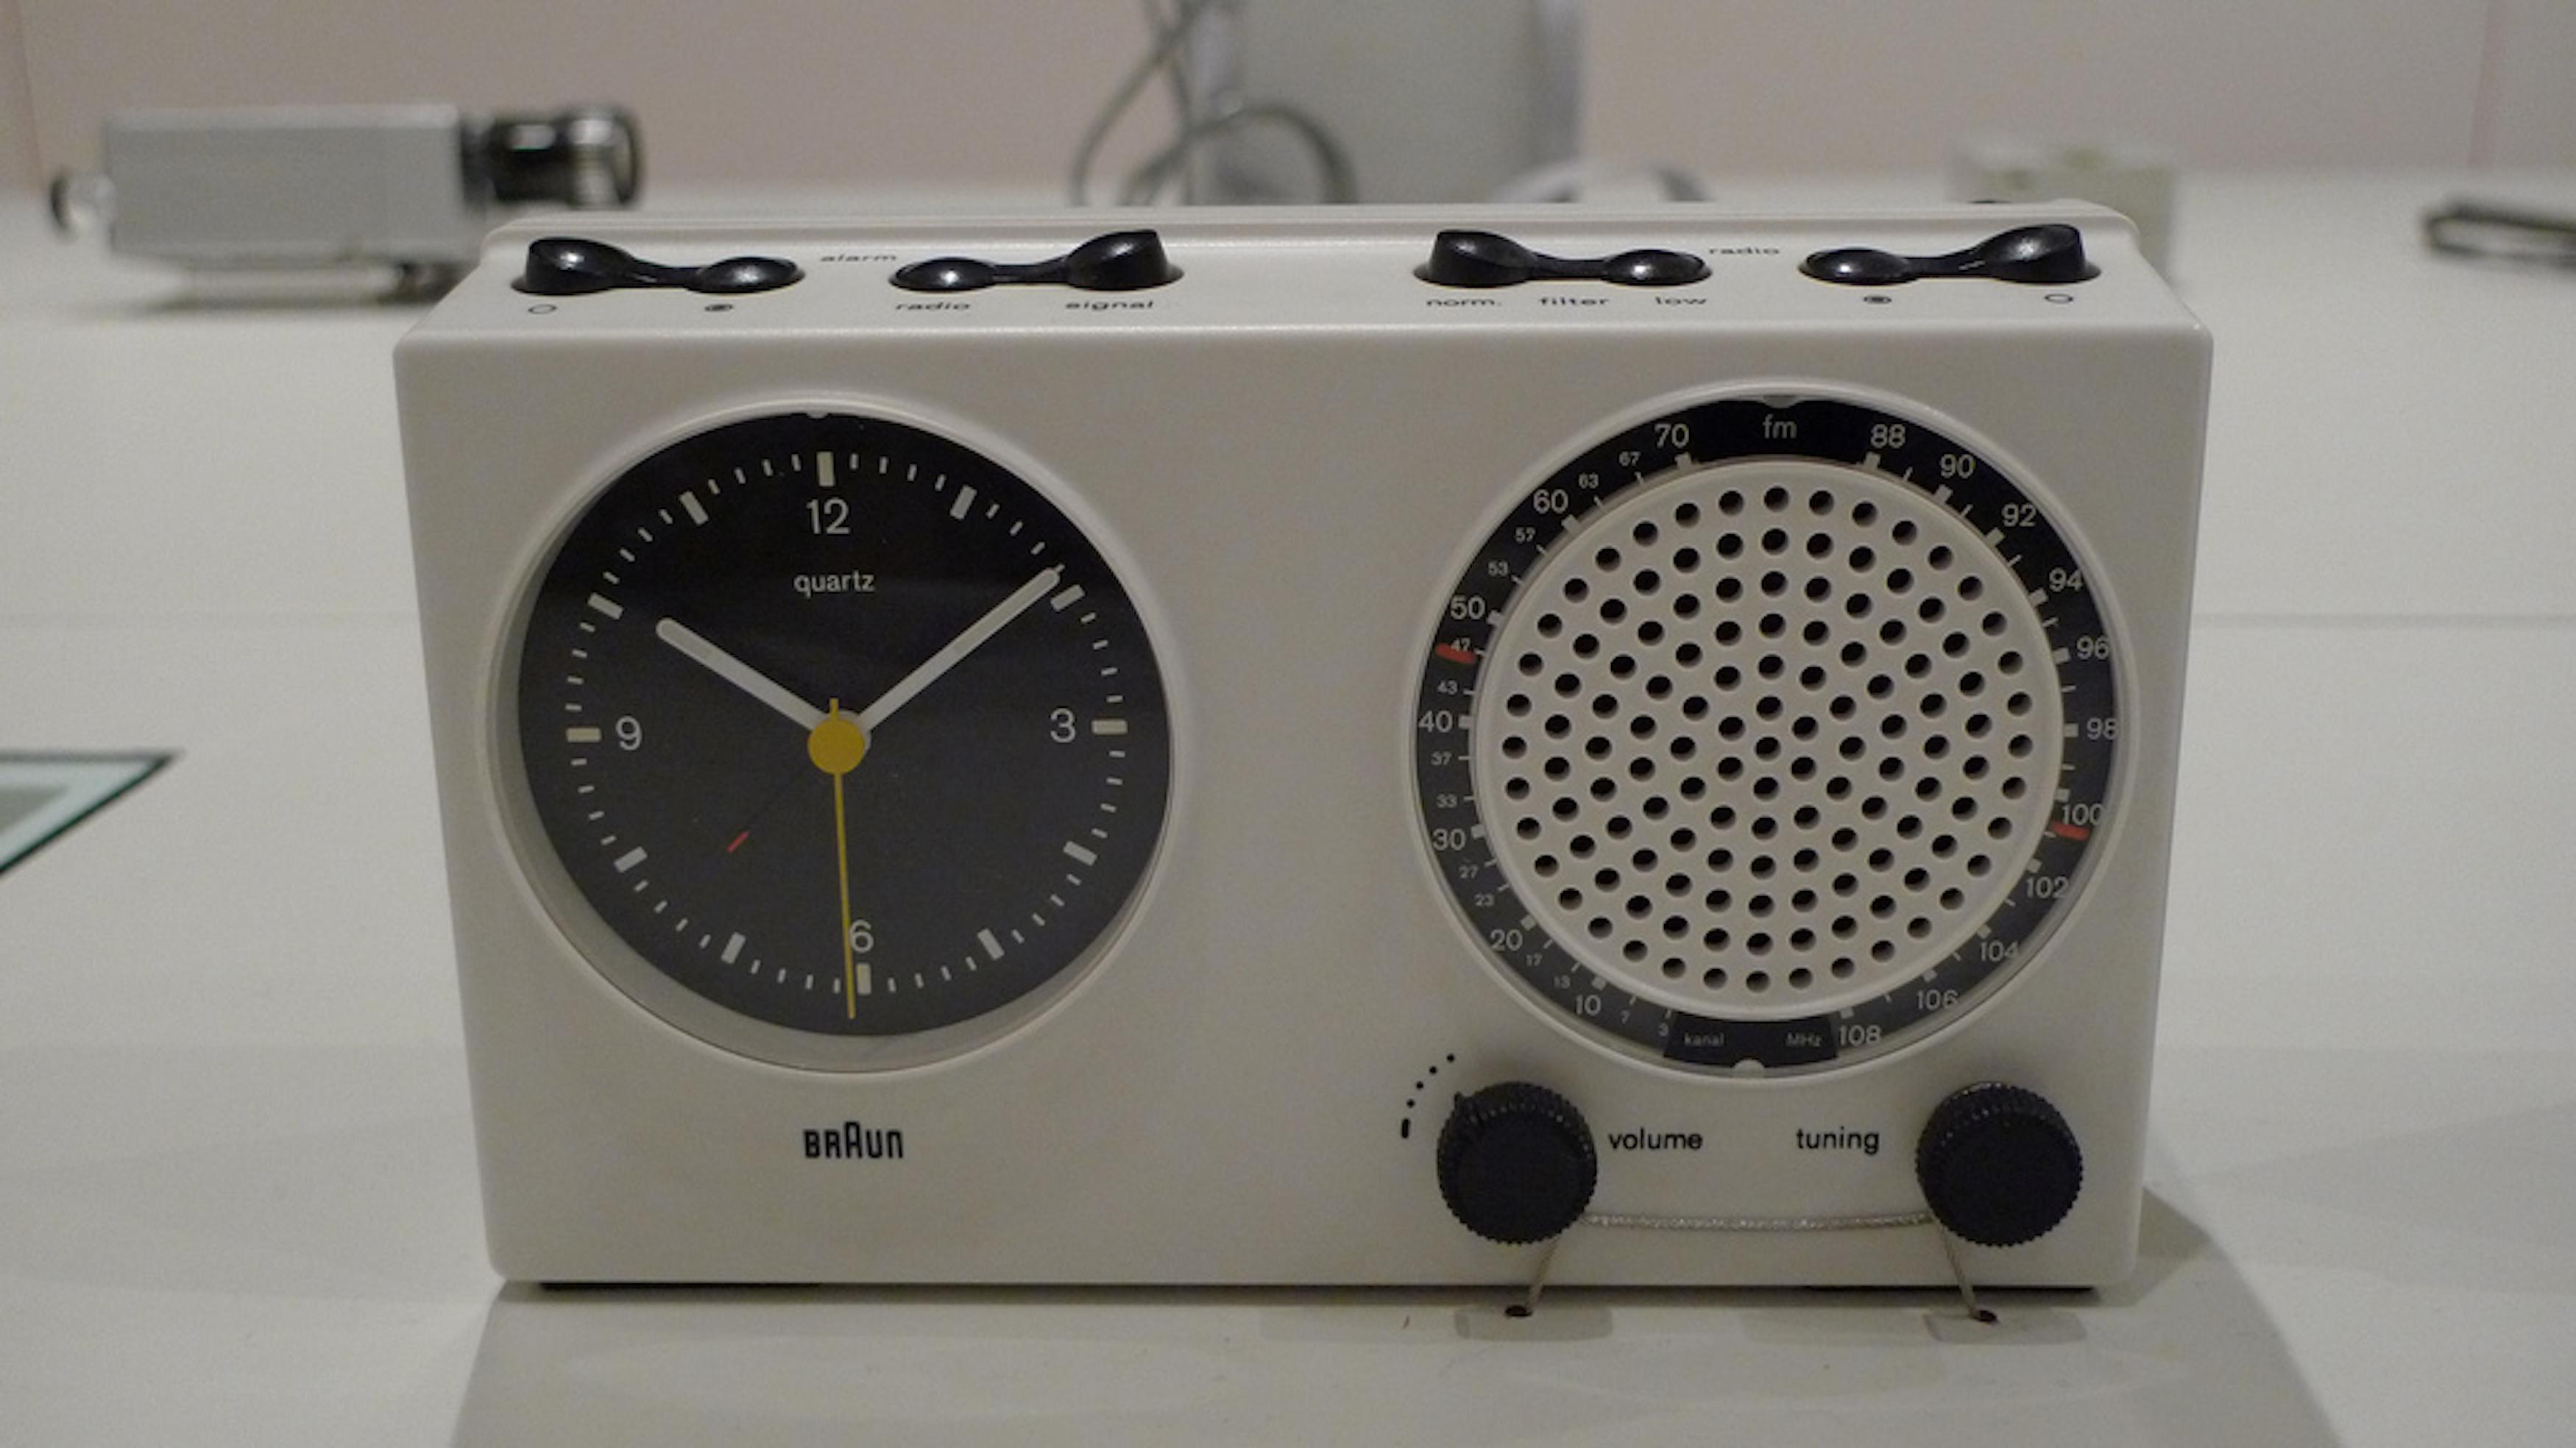 Dieter Rams' famous alarm clock speaks to his sleek, minimalist style.